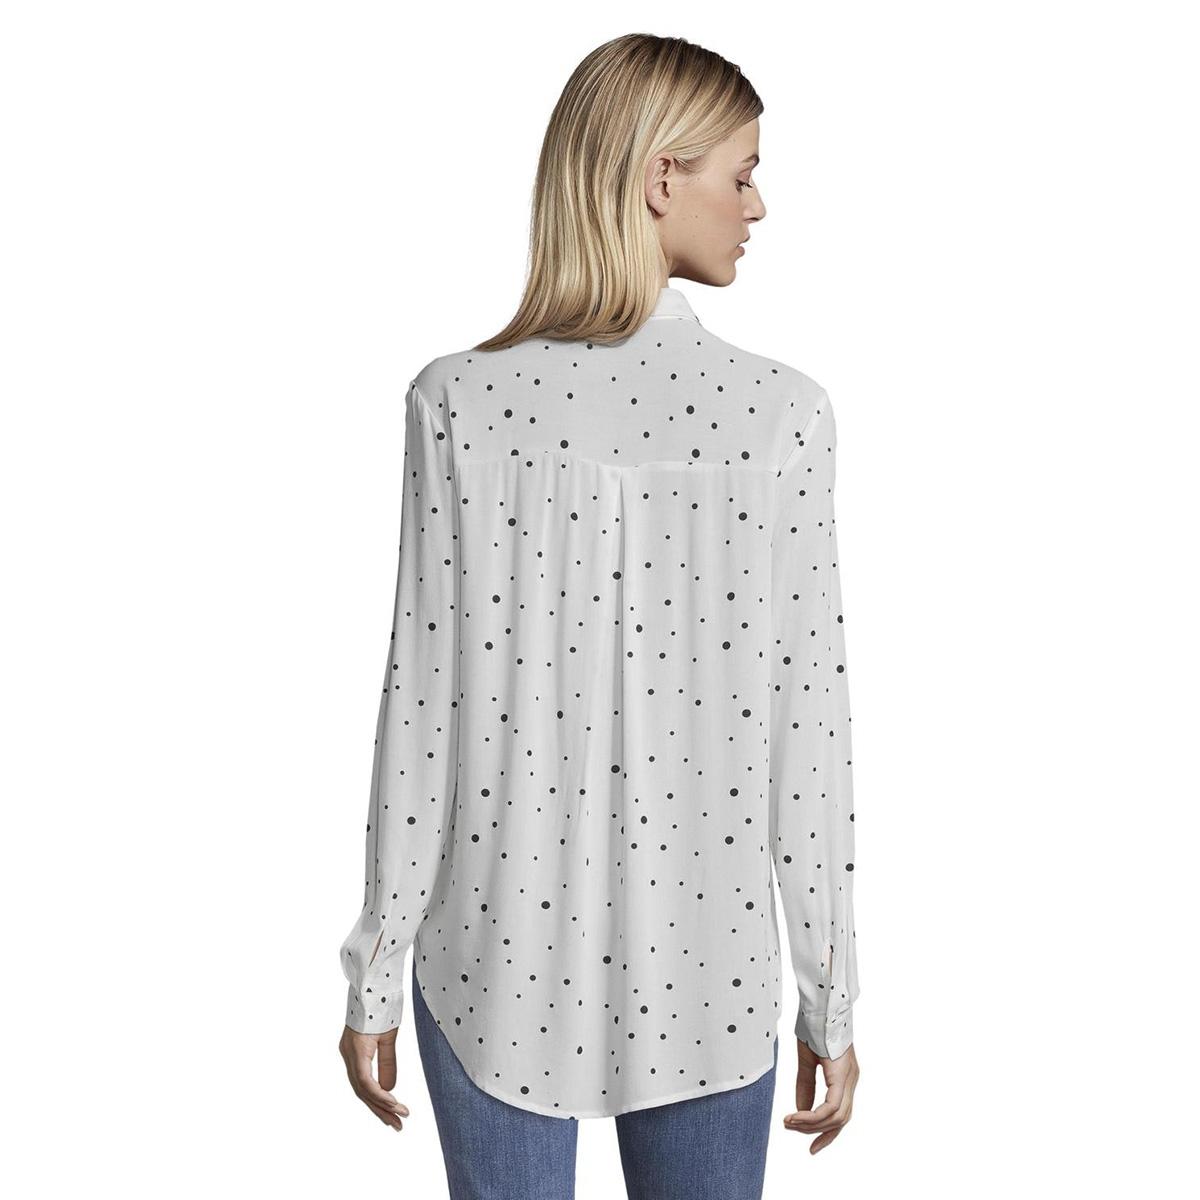 overhemd blouse met patroon 1015036xx71 tom tailor blouse 20401